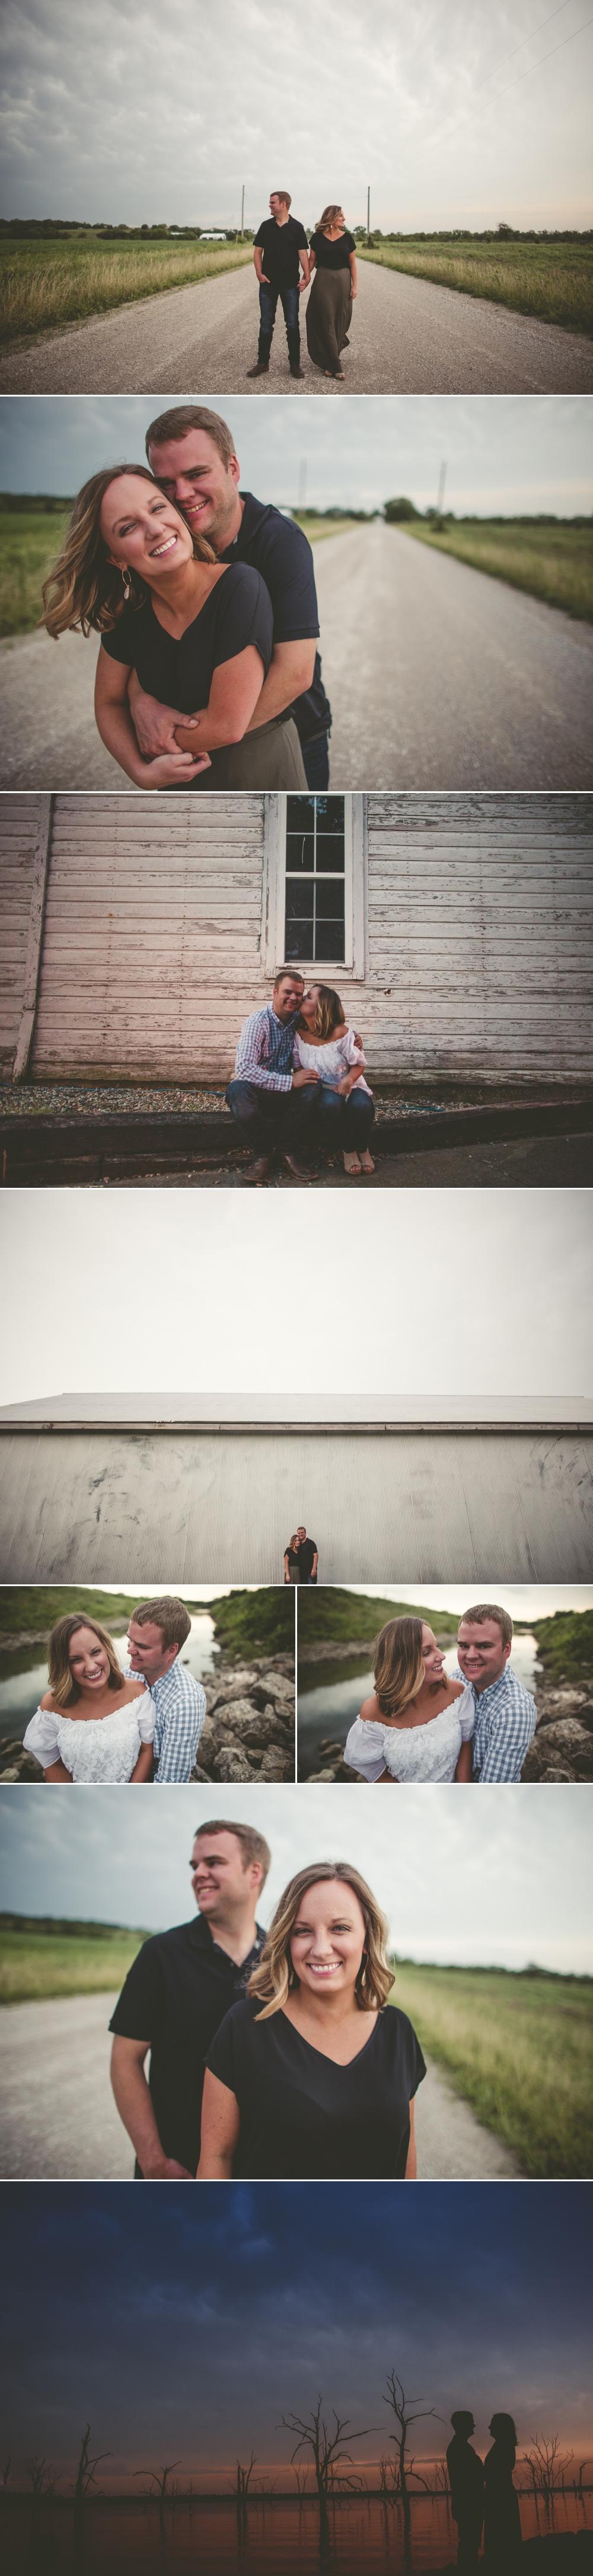 jason_domingues_photography_best_kansas_city_photographer_kc_engagement_session_hillsdale_-ks_0002.jpg